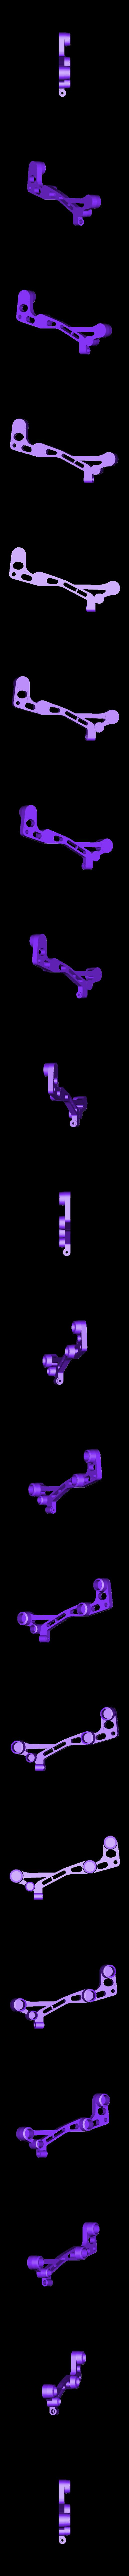 right.stl Download free STL file FPV kit for Turnigy 9XR • 3D print model, 3dxl